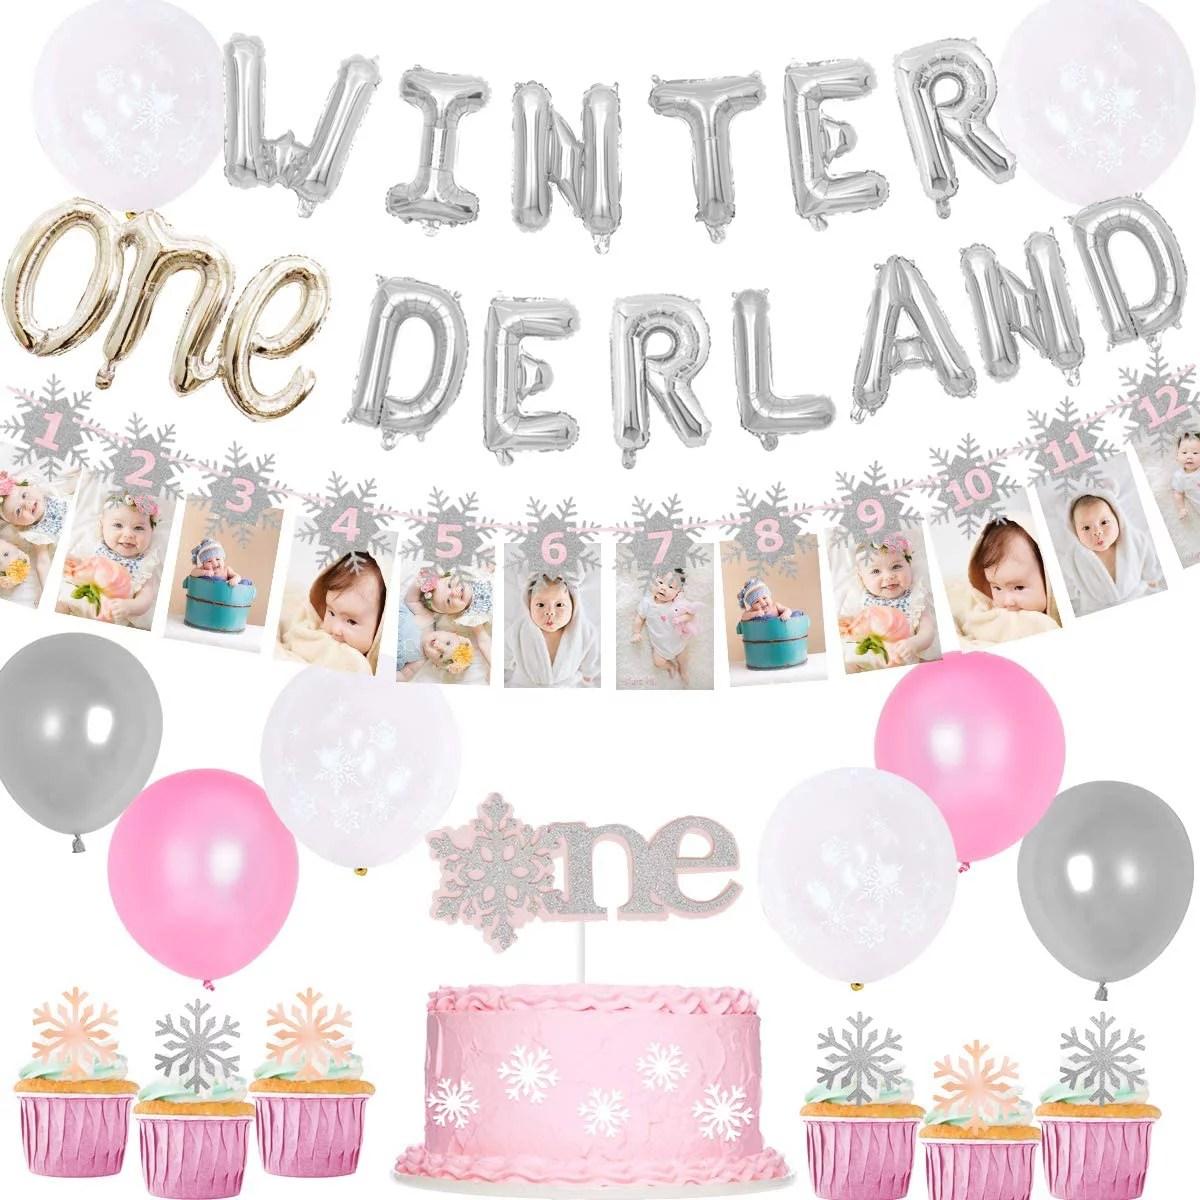 Winter Onederland 1st Birthday Decorations For Princess One Cake Topper Snowflakes 12 Photo Banner Walmart Com Walmart Com